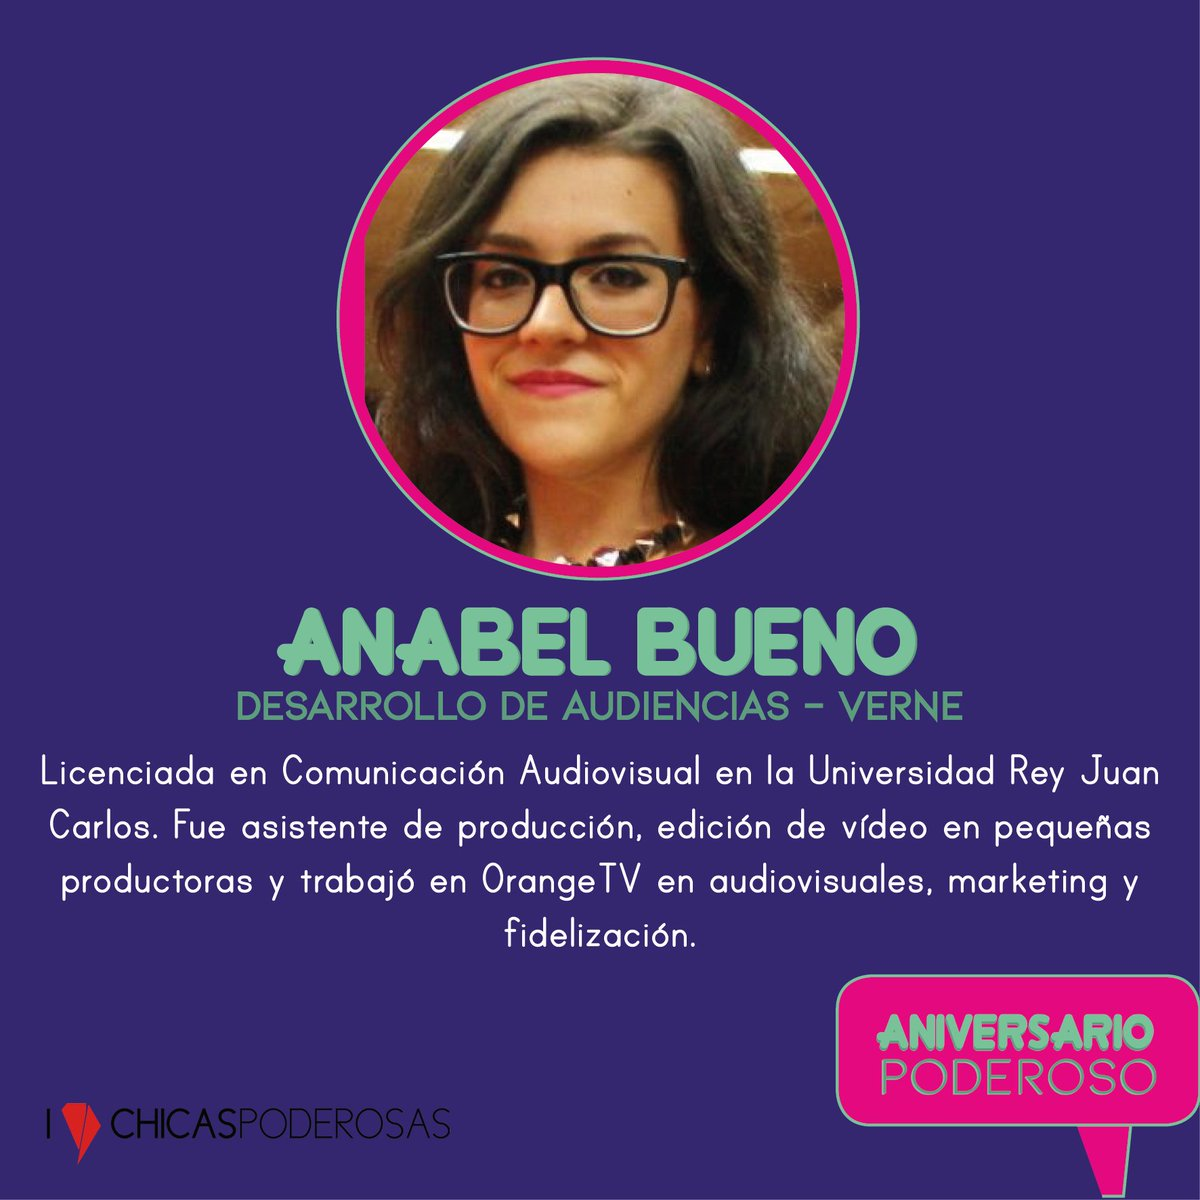 Anabel Verdu periodismoderuptura hashtag on twitter